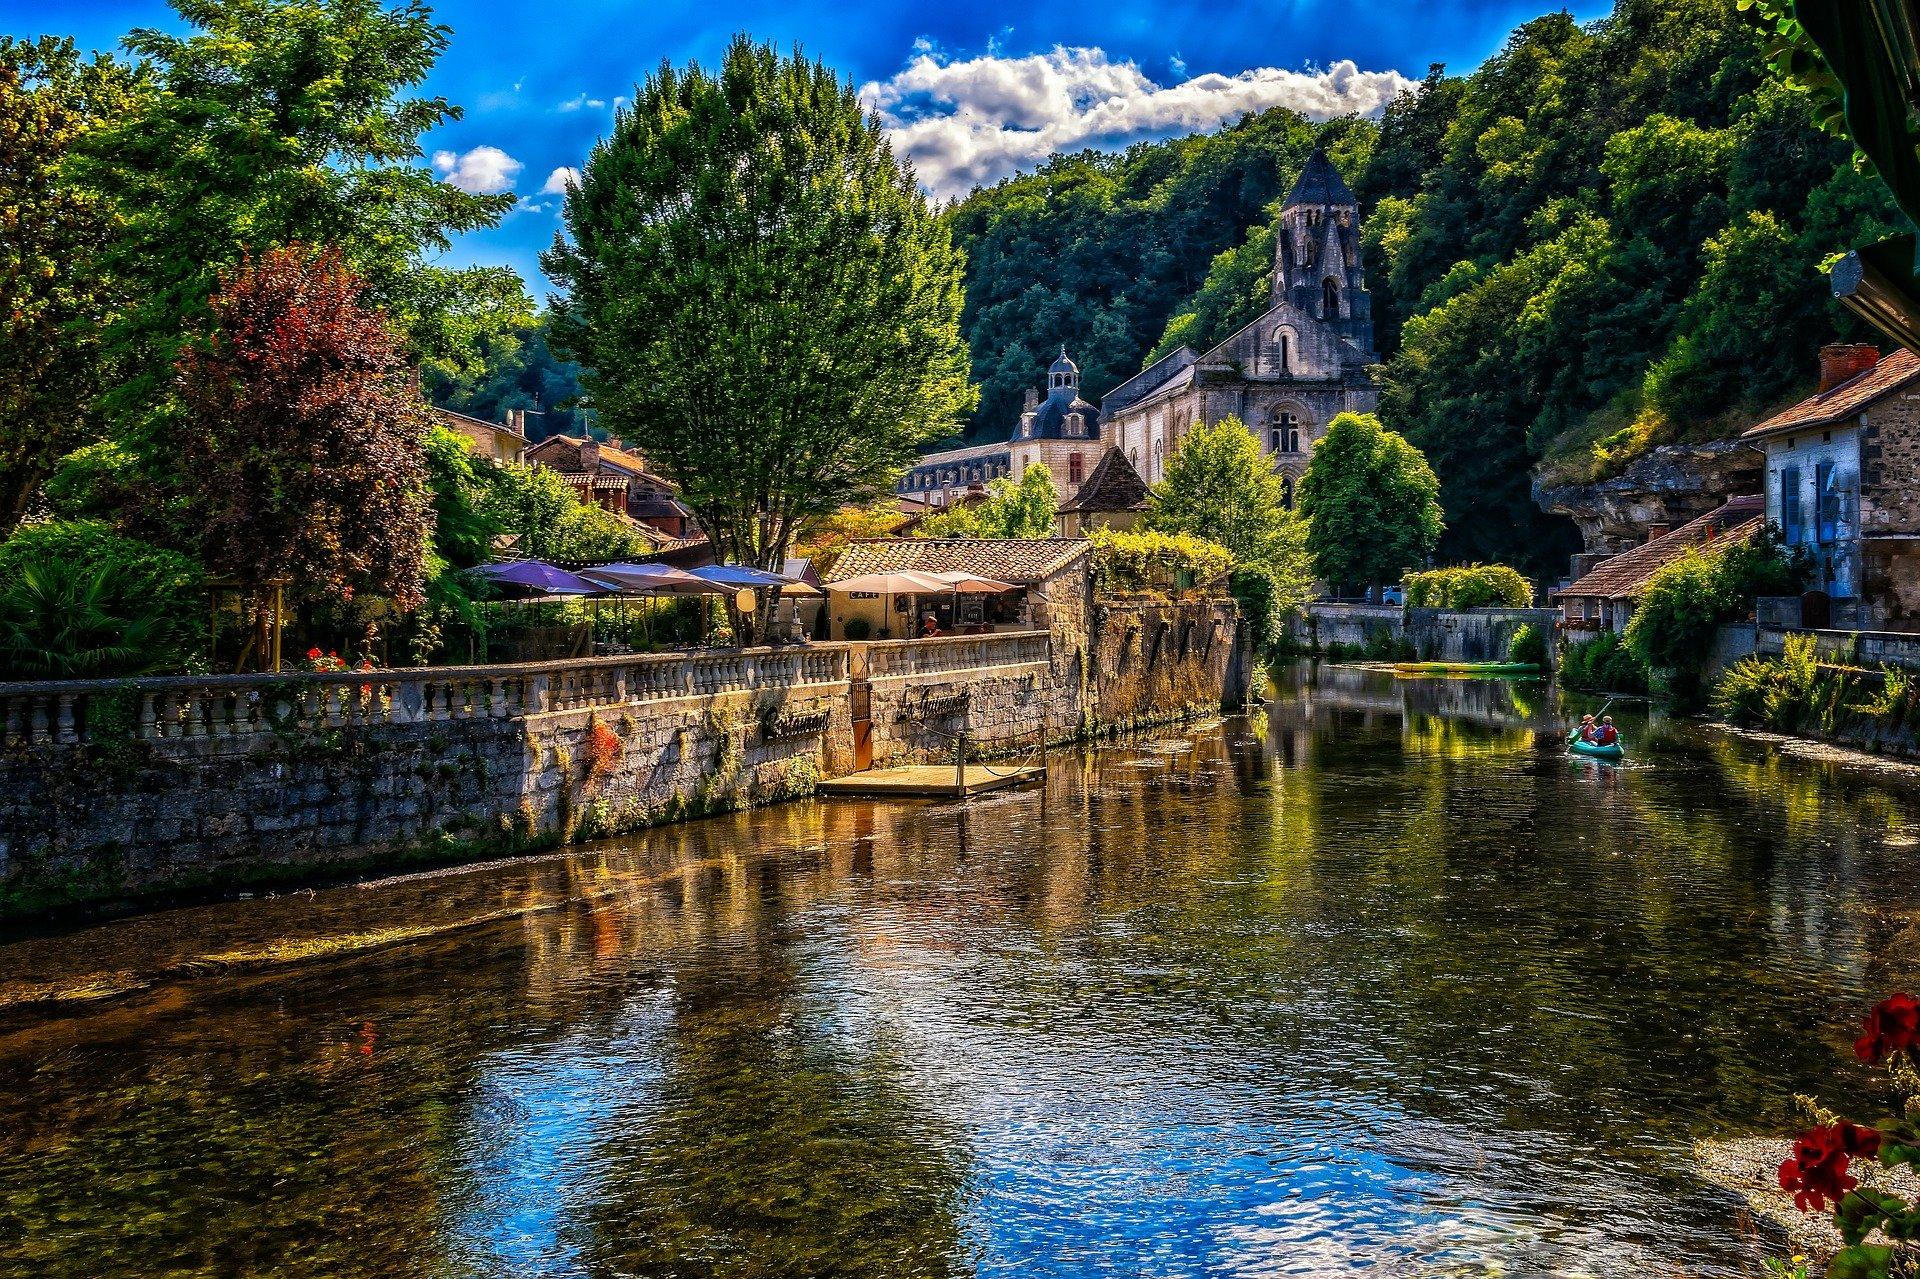 Lastminute Flusskreuzfahrten - Flusskreuzfahrten-Reisen